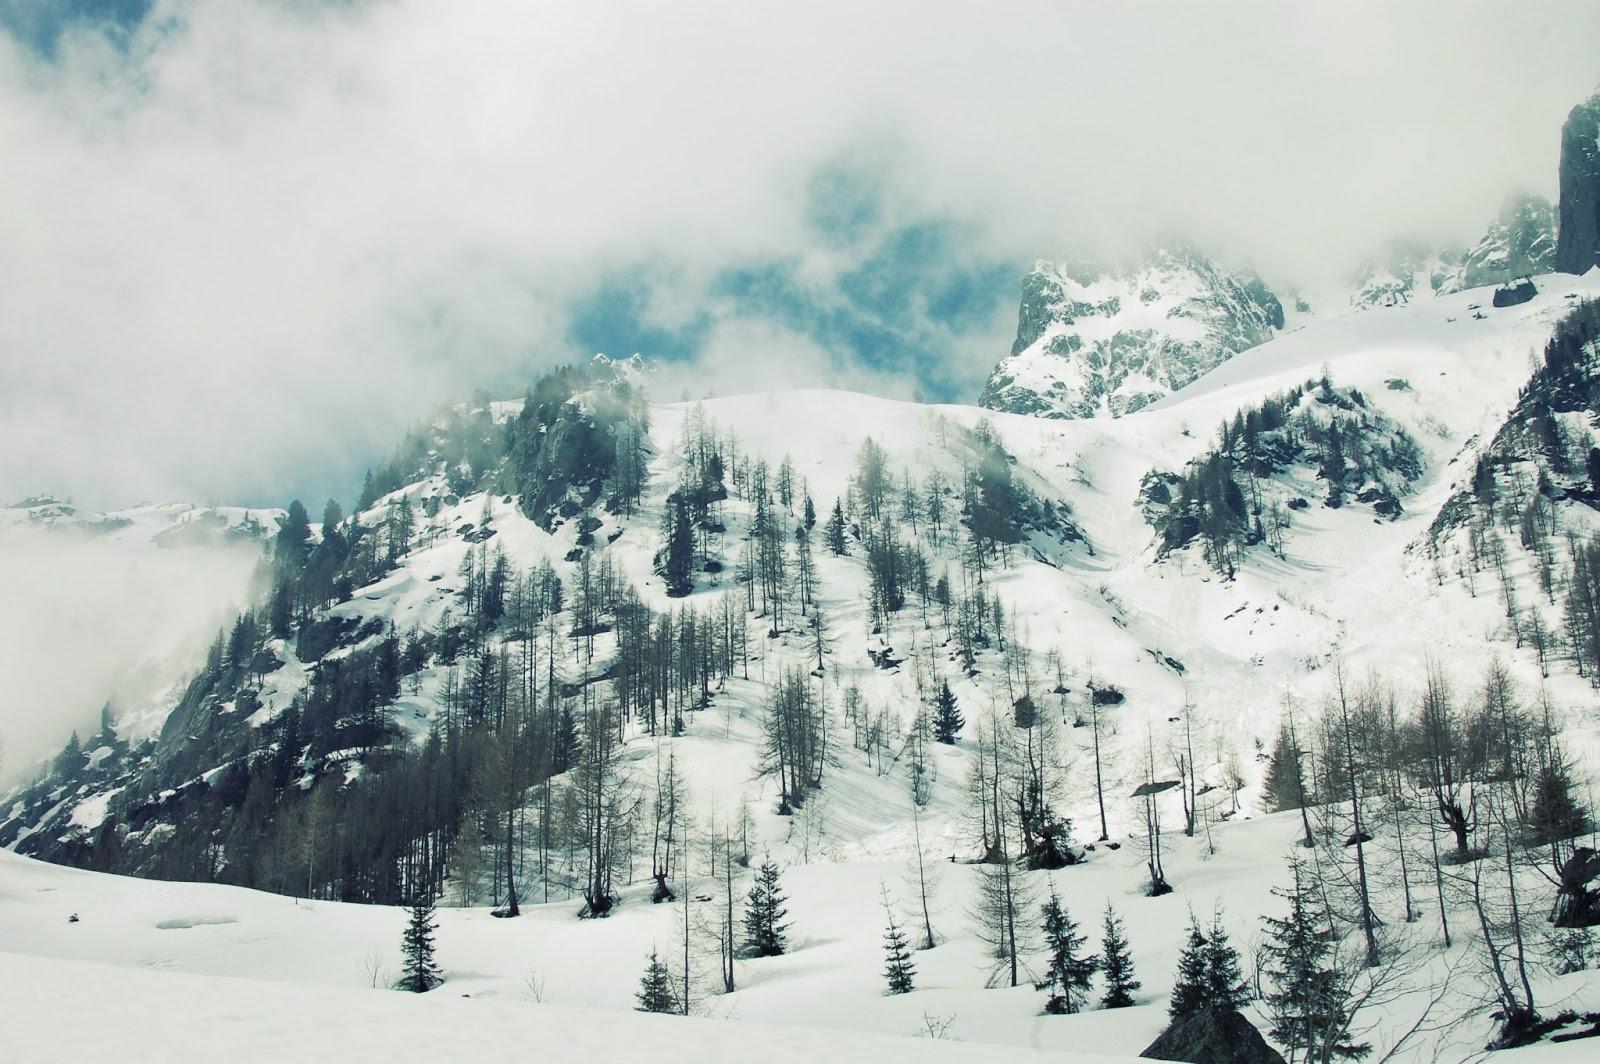 neige-paysage-montagne-sapins-vallorcine-hiver-ciel-bleu